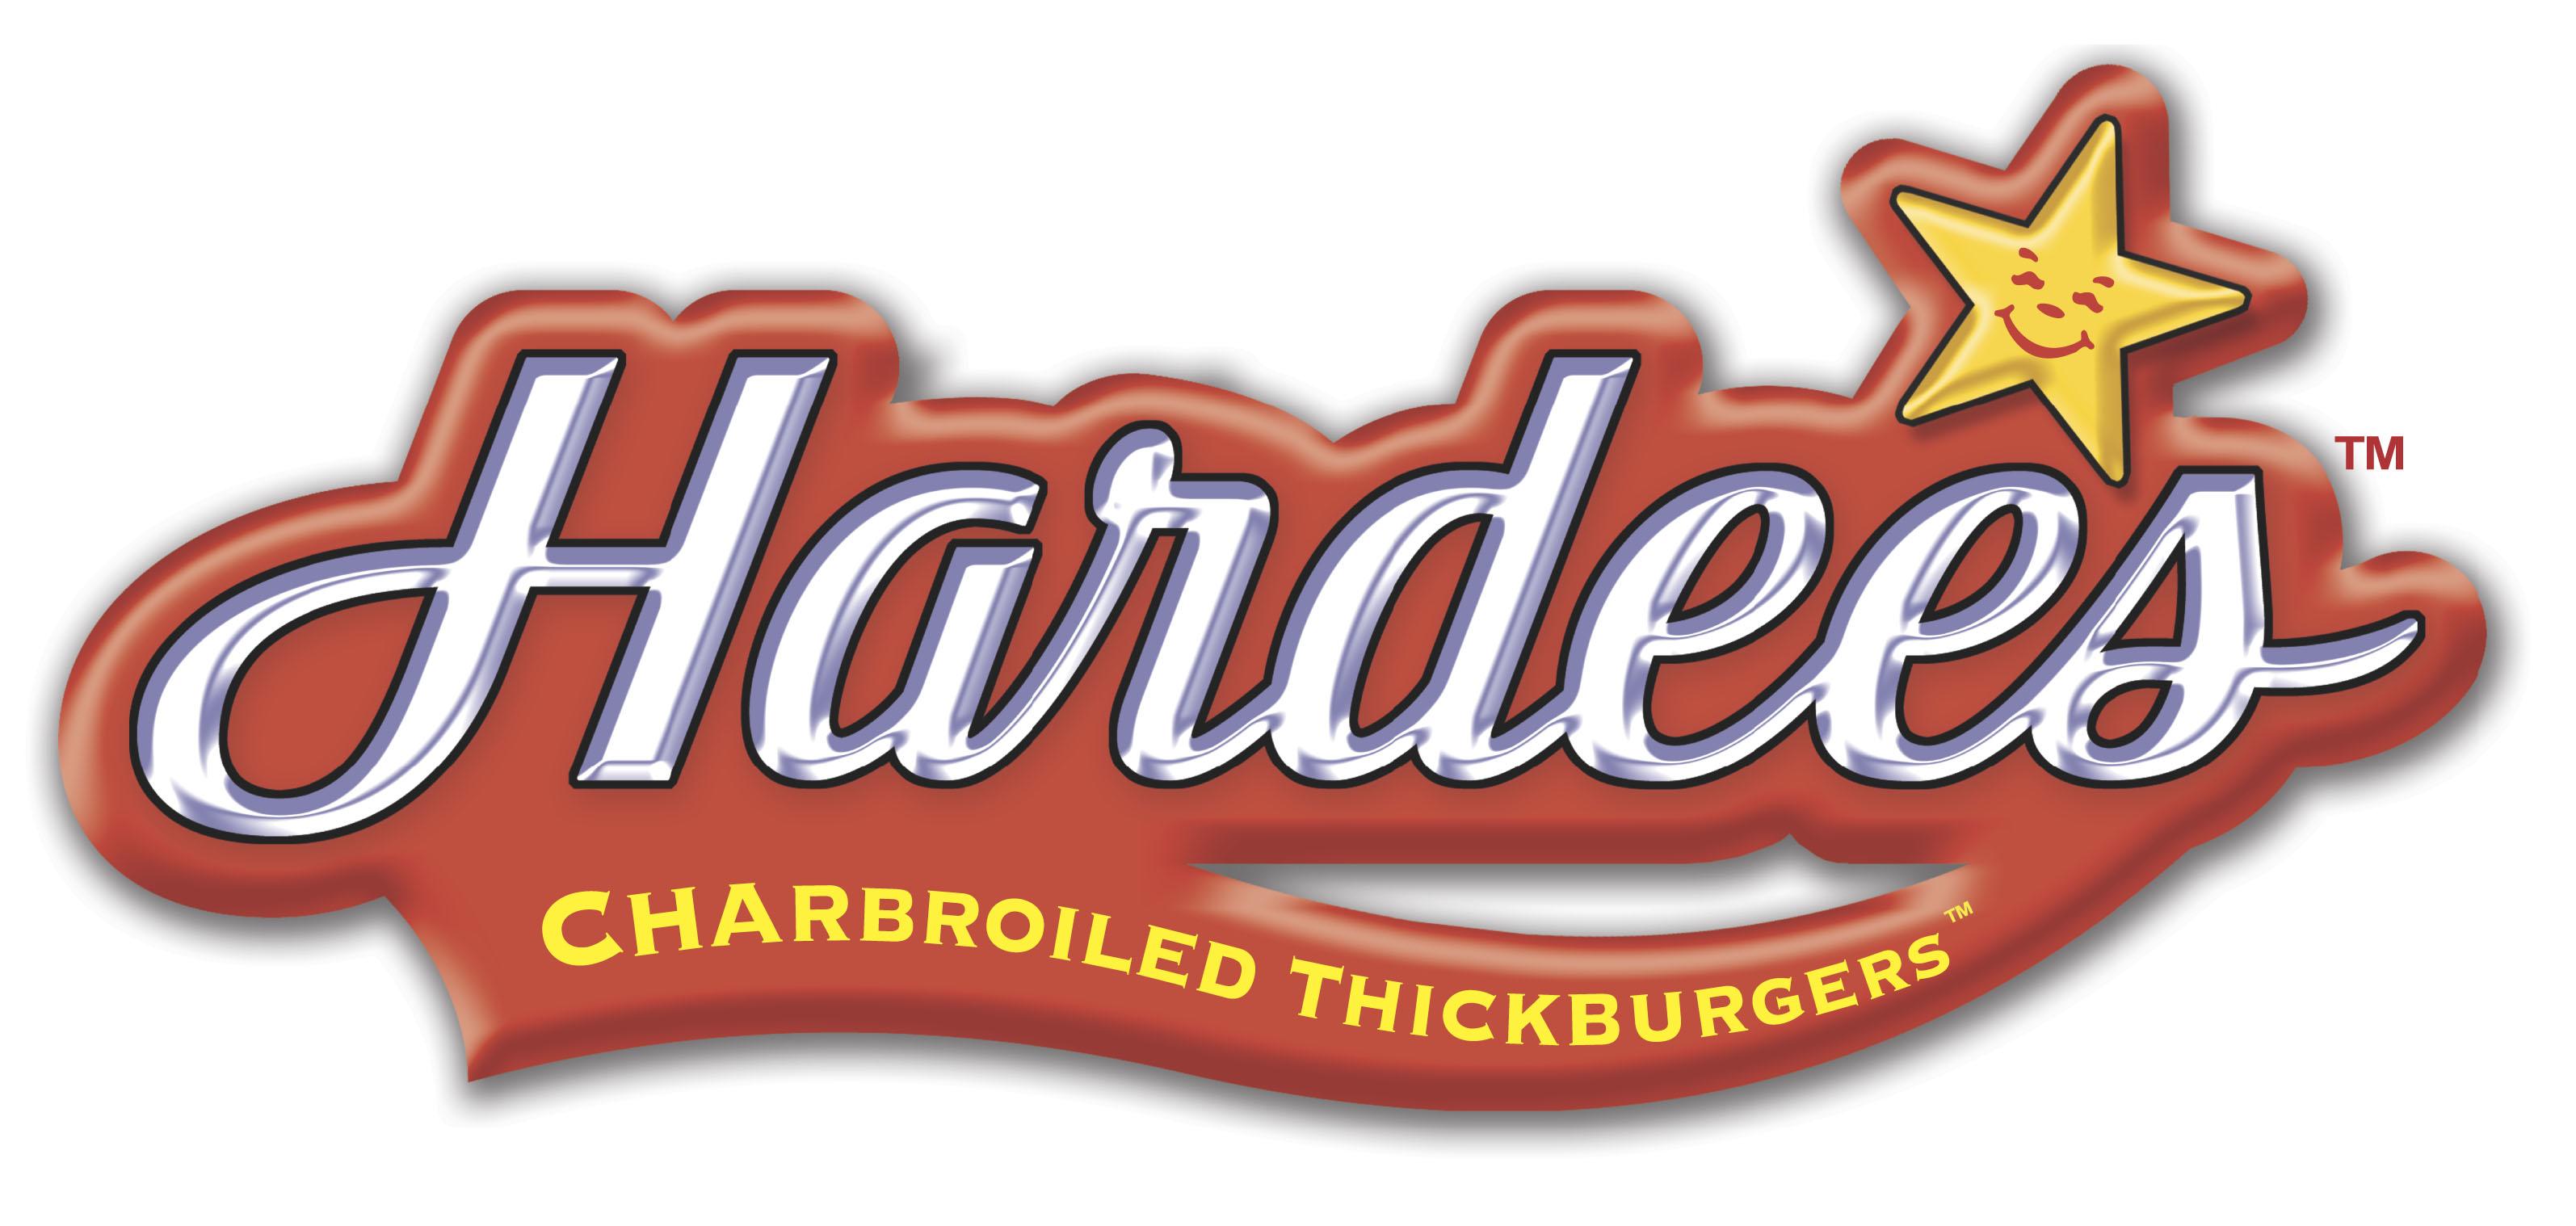 Hardees Logos.